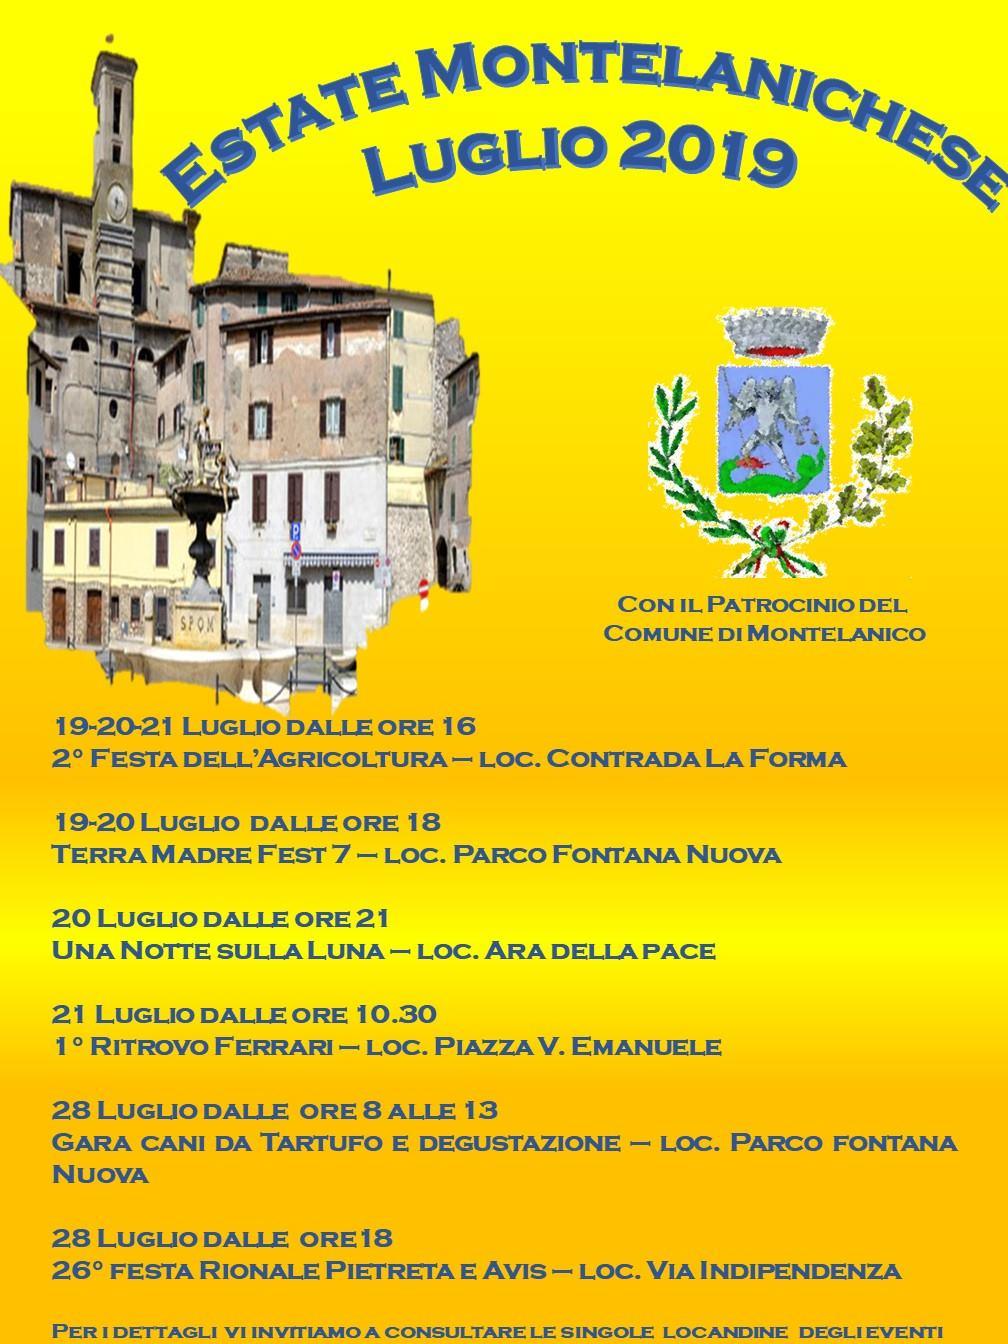 Estate Montelanichese 2019 @ paese | Montelanico | Lazio | Italia